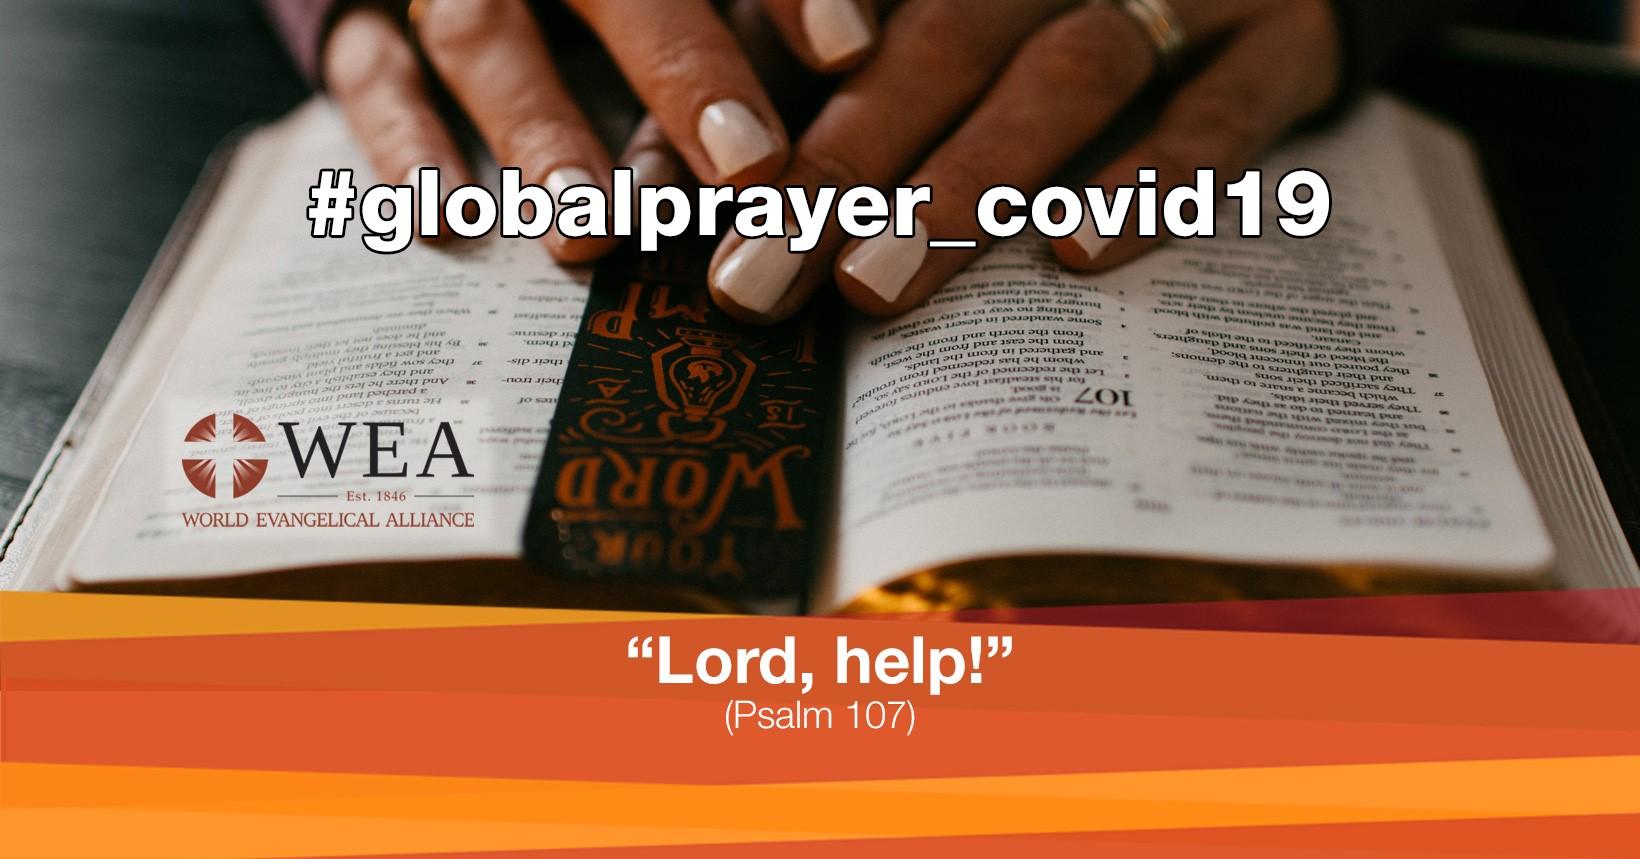 Global Day of Prayer and Fasting amid the ongoing COVID-19 pandemic - This day of PRAYER and FASTING is set for Sunday, March 29, 2020. globalprayer_covid19 #GlobalDayofPrayerandFasting #COVID19 #Coronavirus